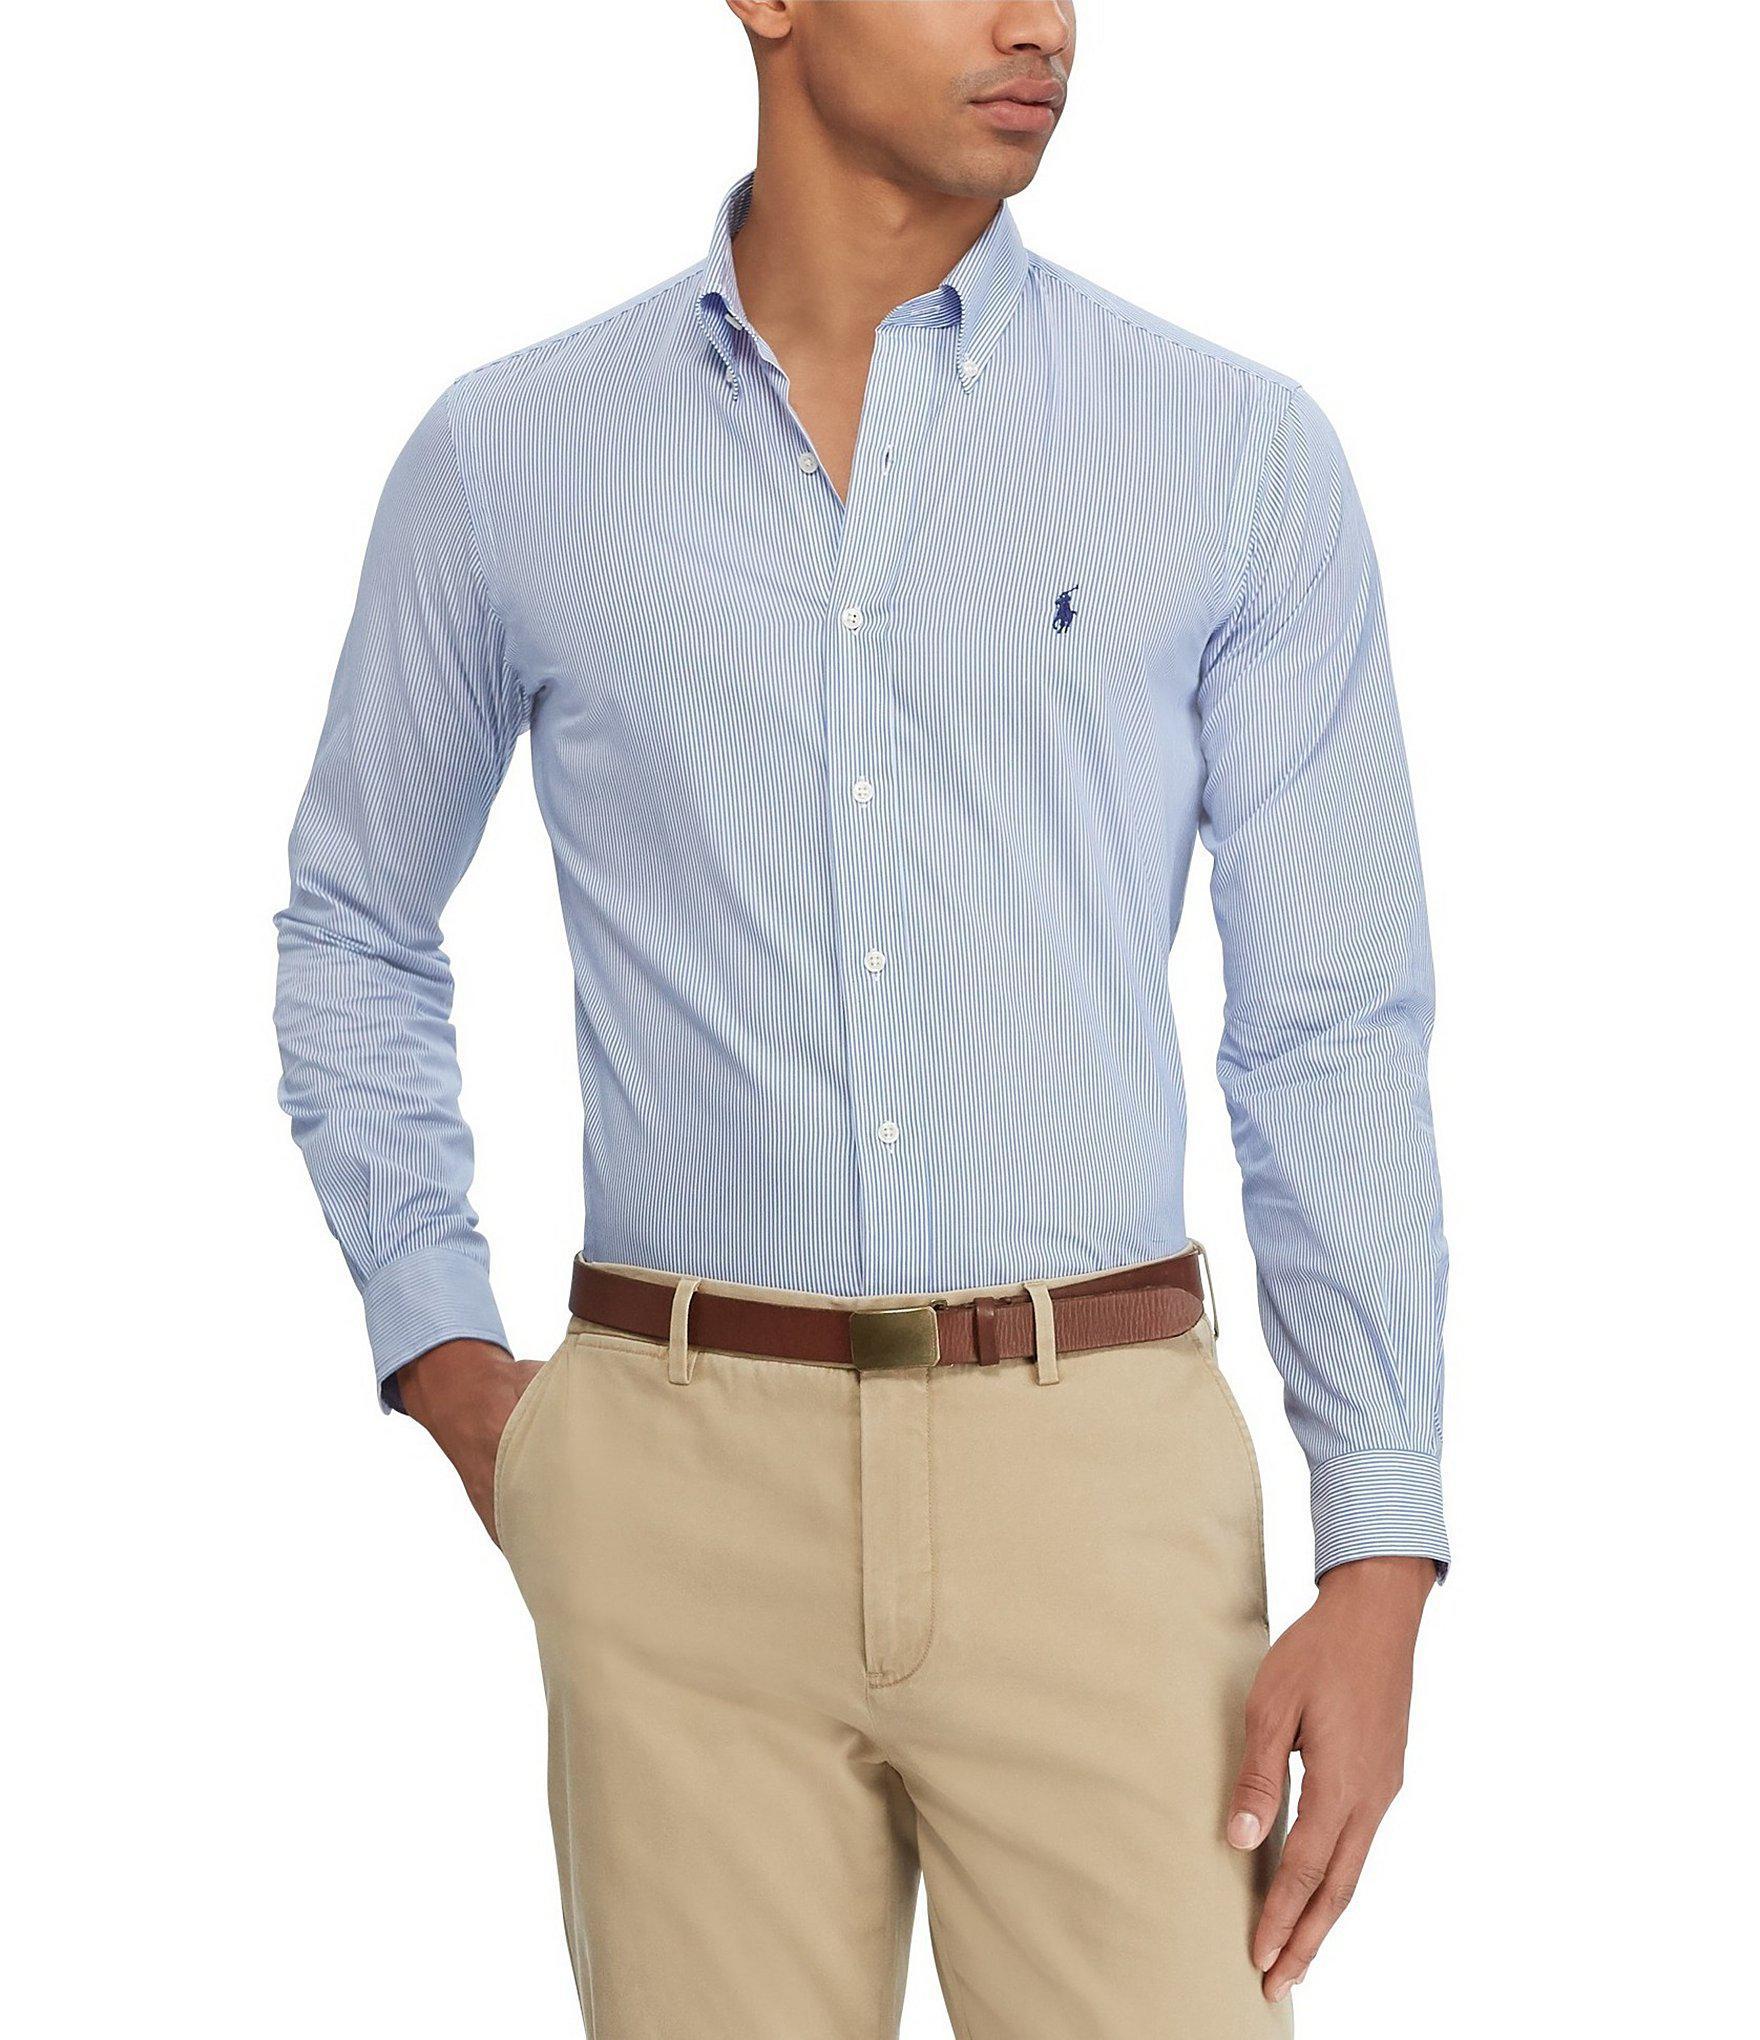 061593f91 Polo Ralph Lauren - Blue Stripe Stretch Poplin Long-sleeve Woven Shirt for  Men -. View fullscreen